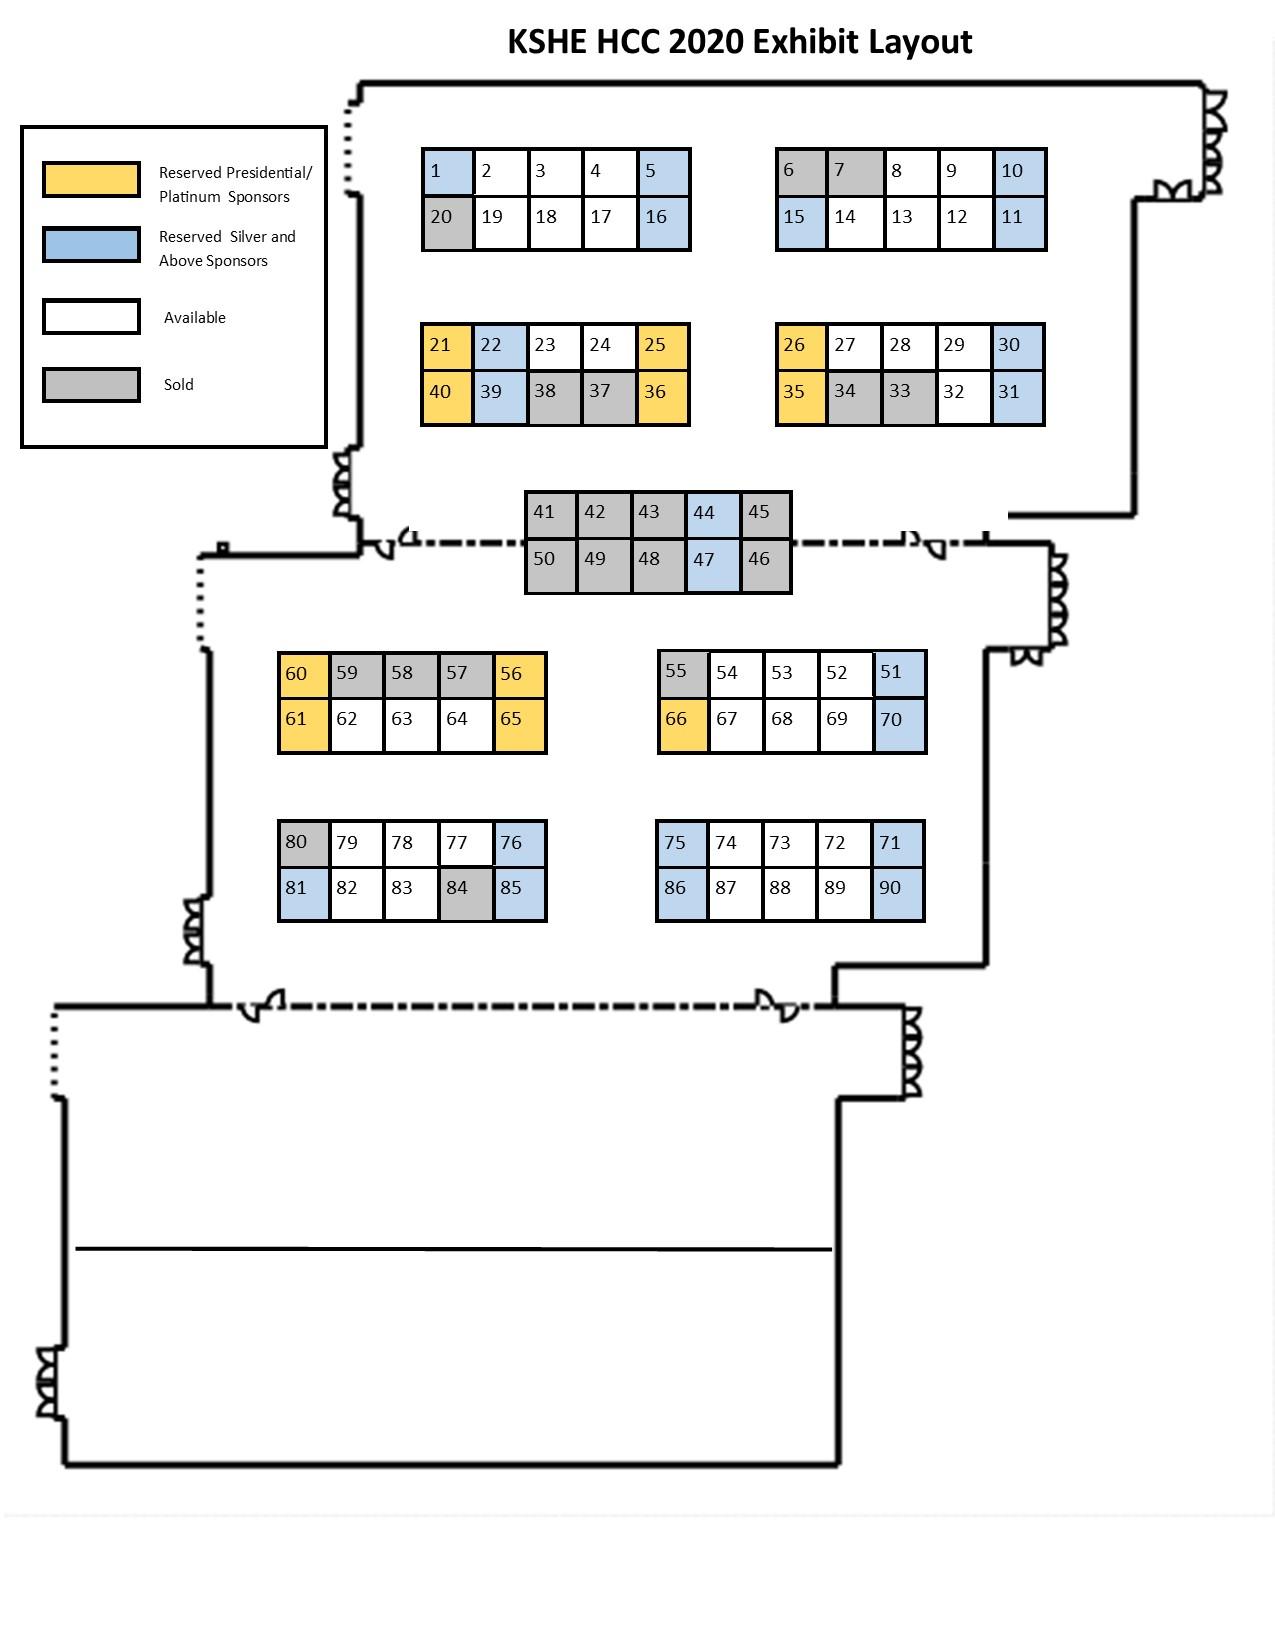 KSHE HCC exhibitor floorplan